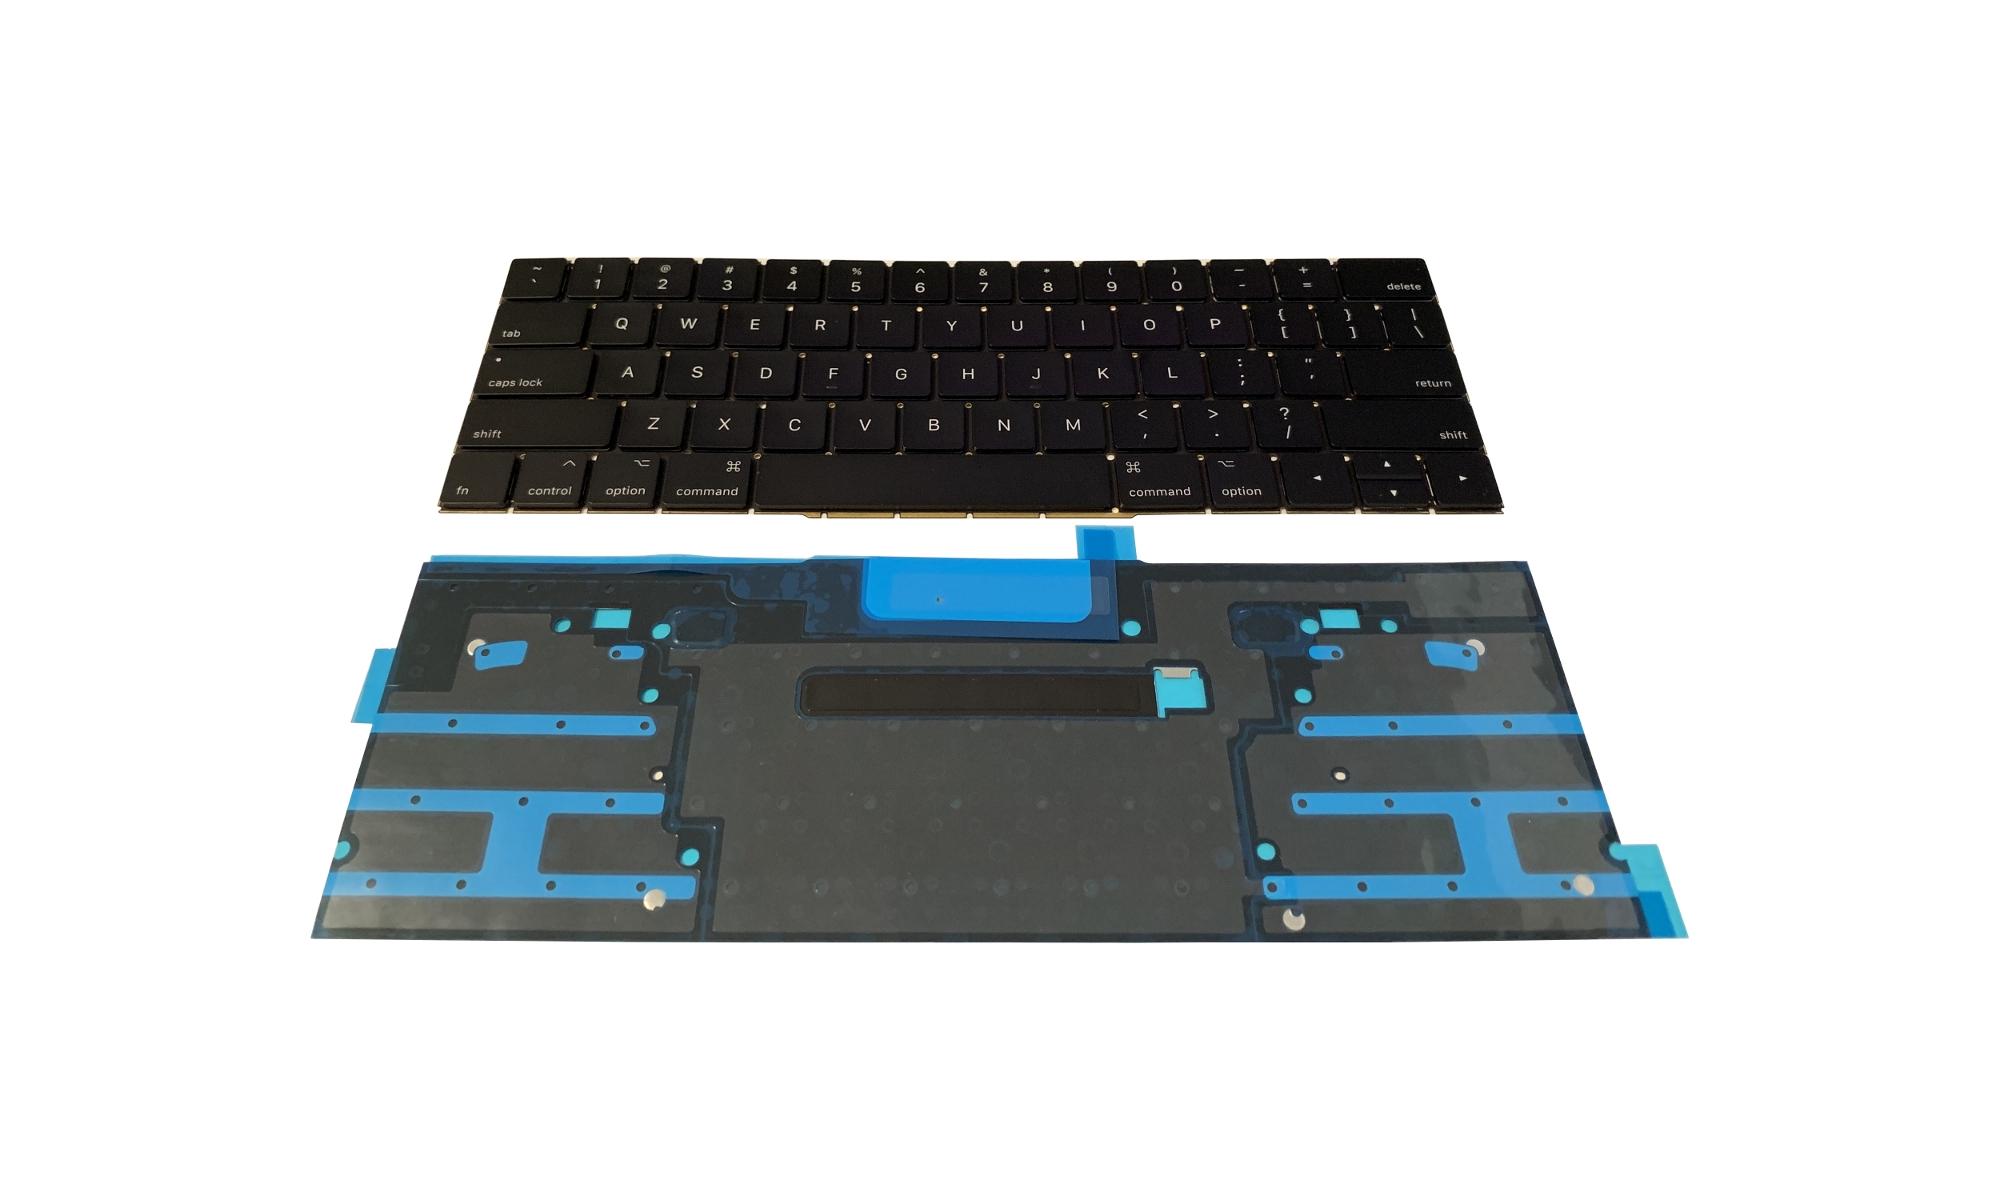 "Tastatura Apple MacBook Pro 15"" A1707 Touch Bar (Late 2016, mid 2017) cu modul iluminare, layout US"